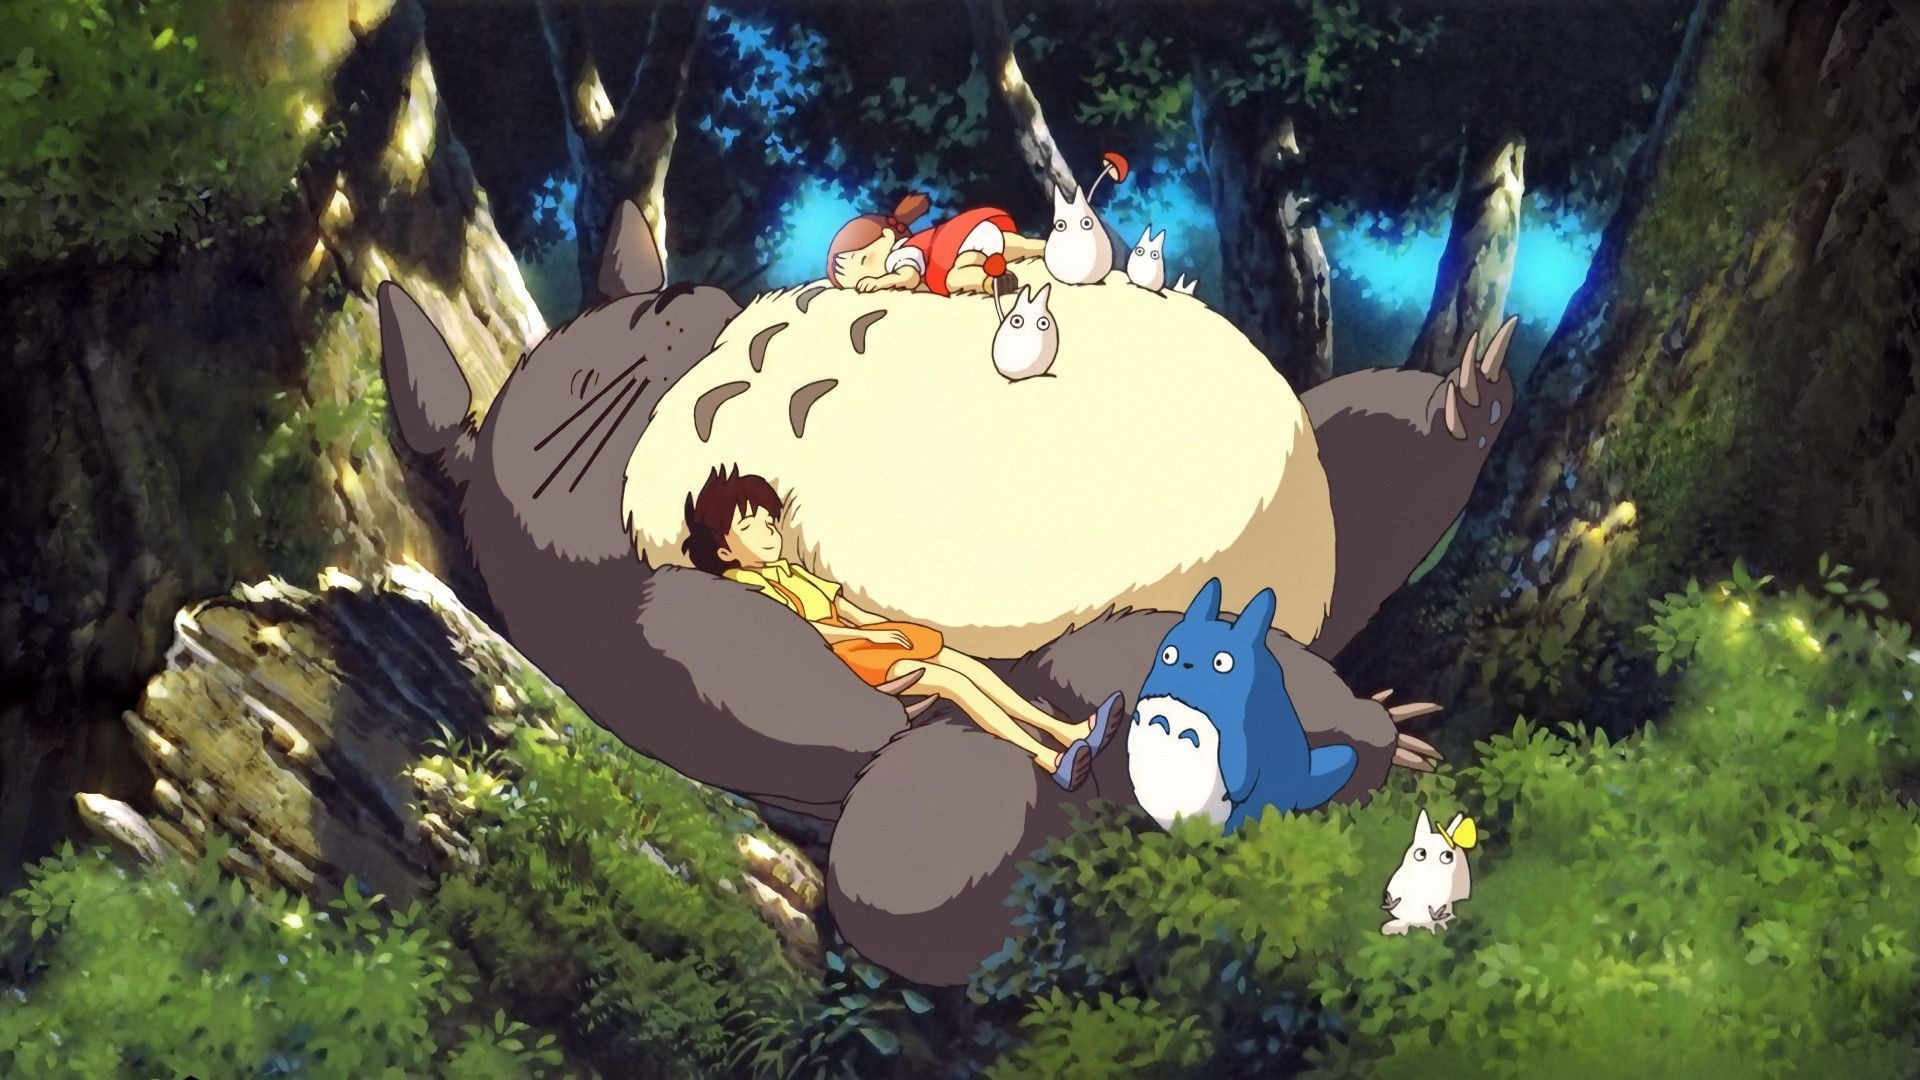 My Neighbor Totoro Wallpapers HD Download 1920×1080 Totoro Wallpaper (43  Wallpapers)  